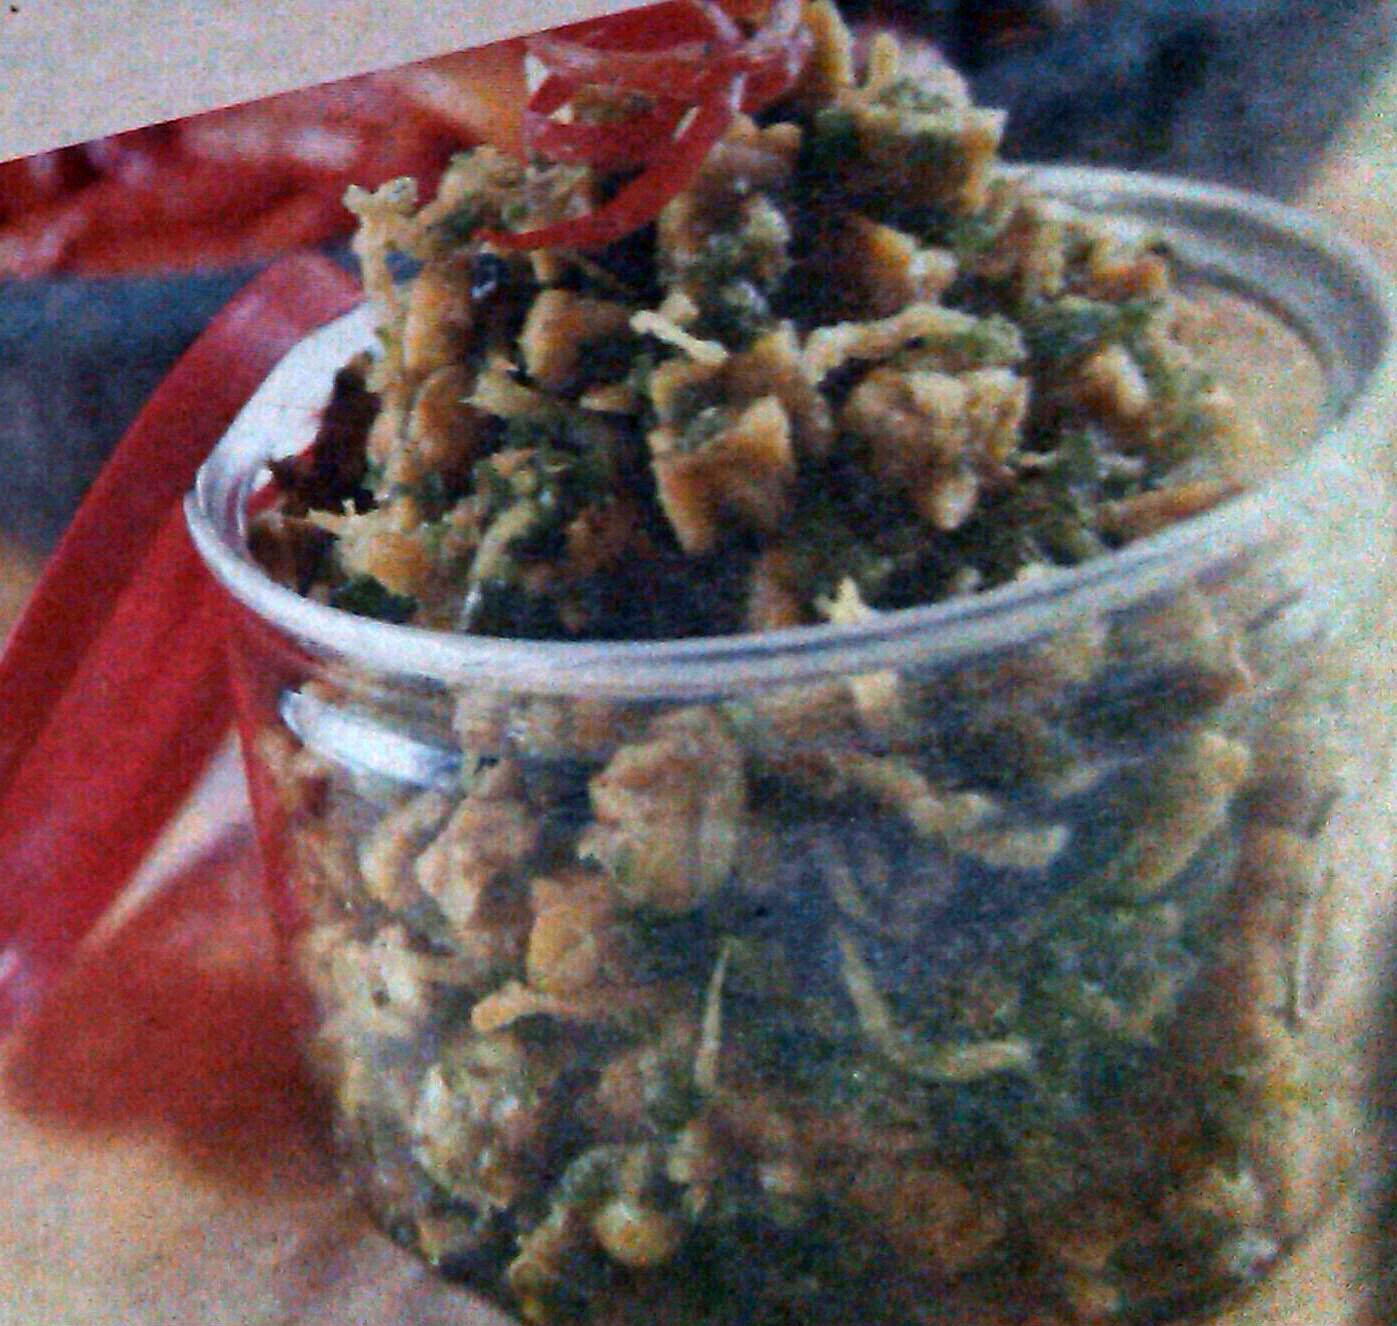 resep-teri-kacang-sambal-ijo